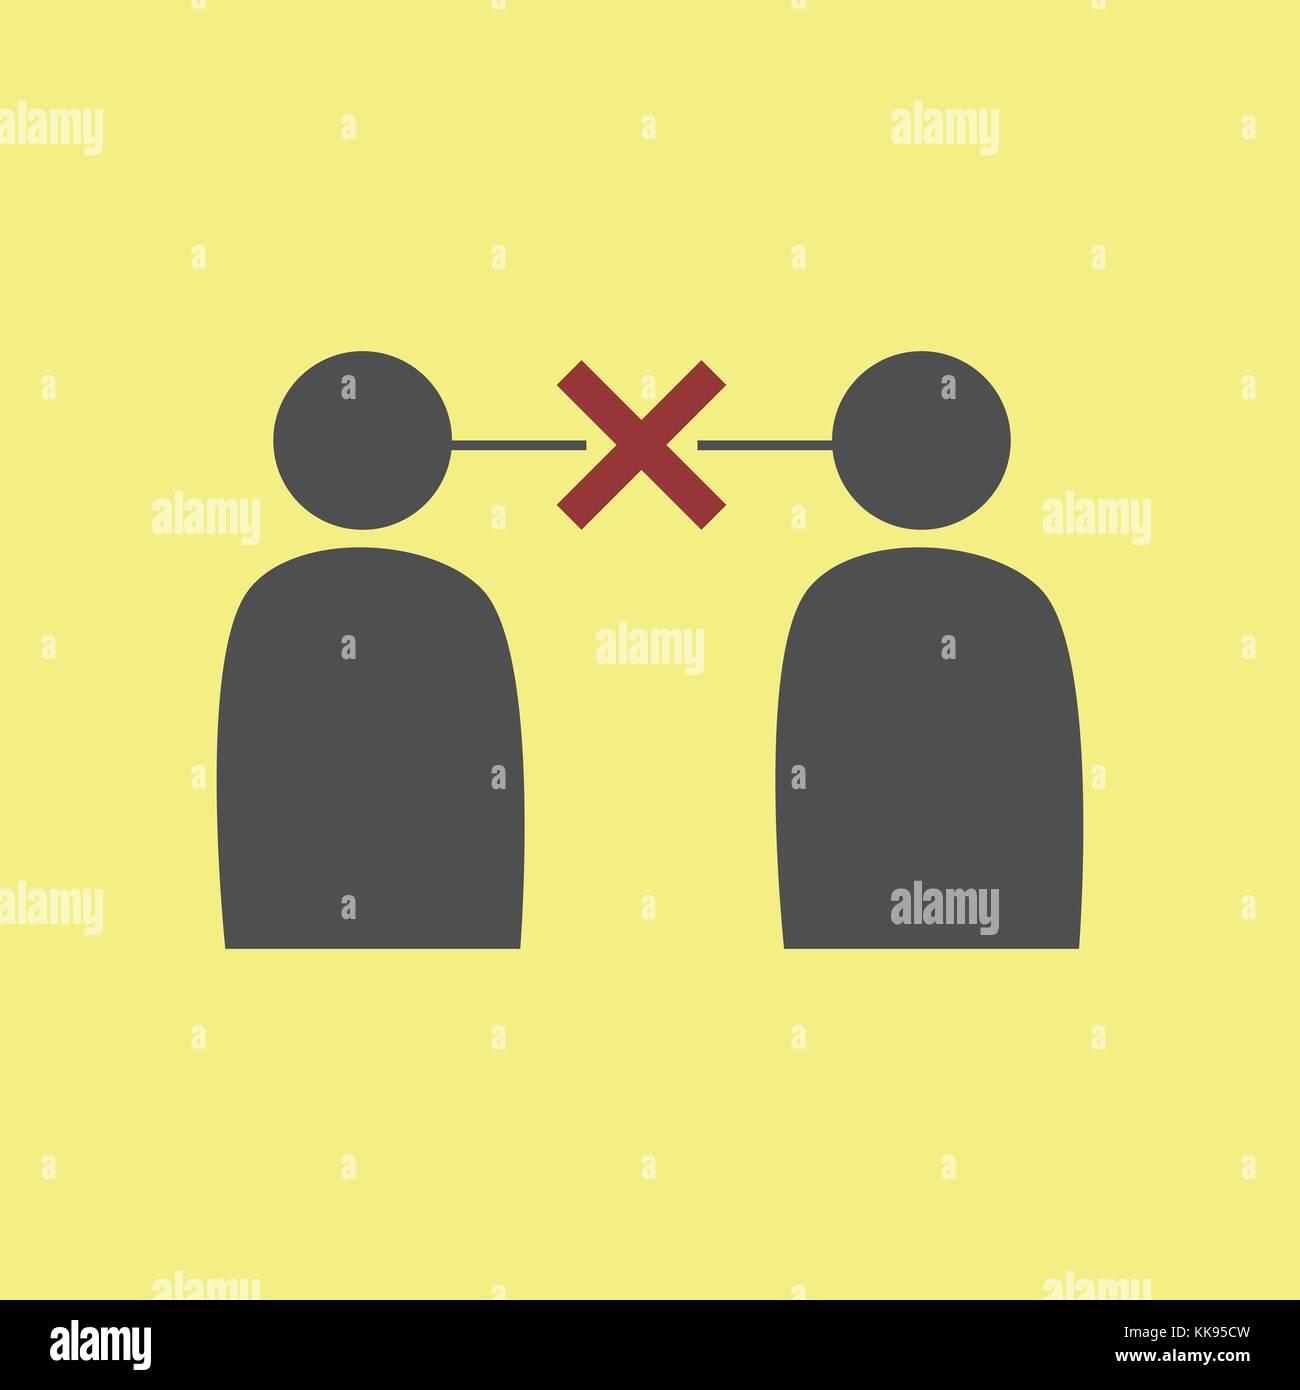 Simple Miscommunication Symbol Vector Graphic Illustration Design - Stock Image